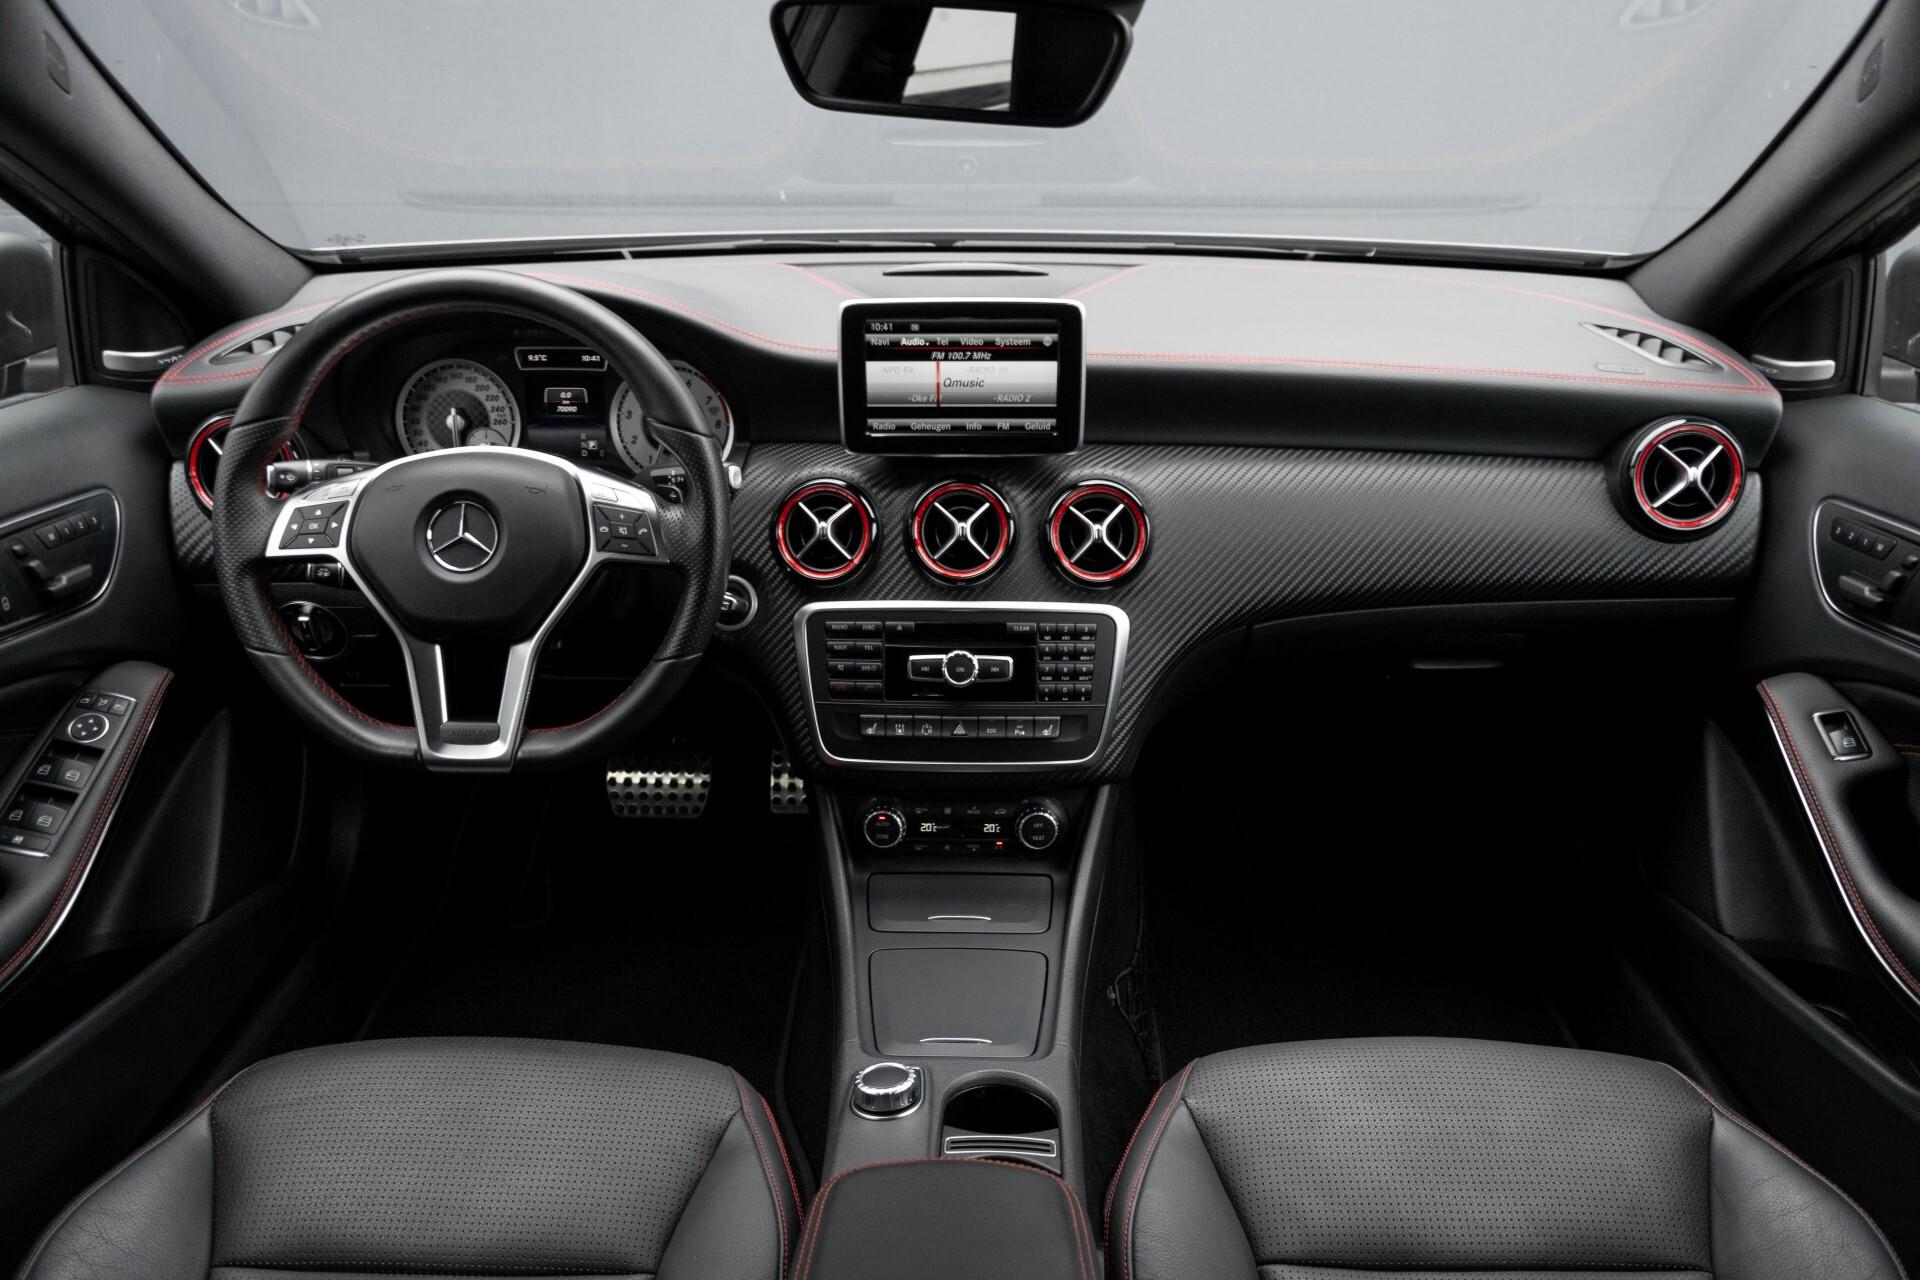 Mercedes-Benz A-Klasse 250 Sport AMG Panorama/Standkachel/Mem/Harman-Kardon/Distronic/Camera/Com Aut7 Foto 10